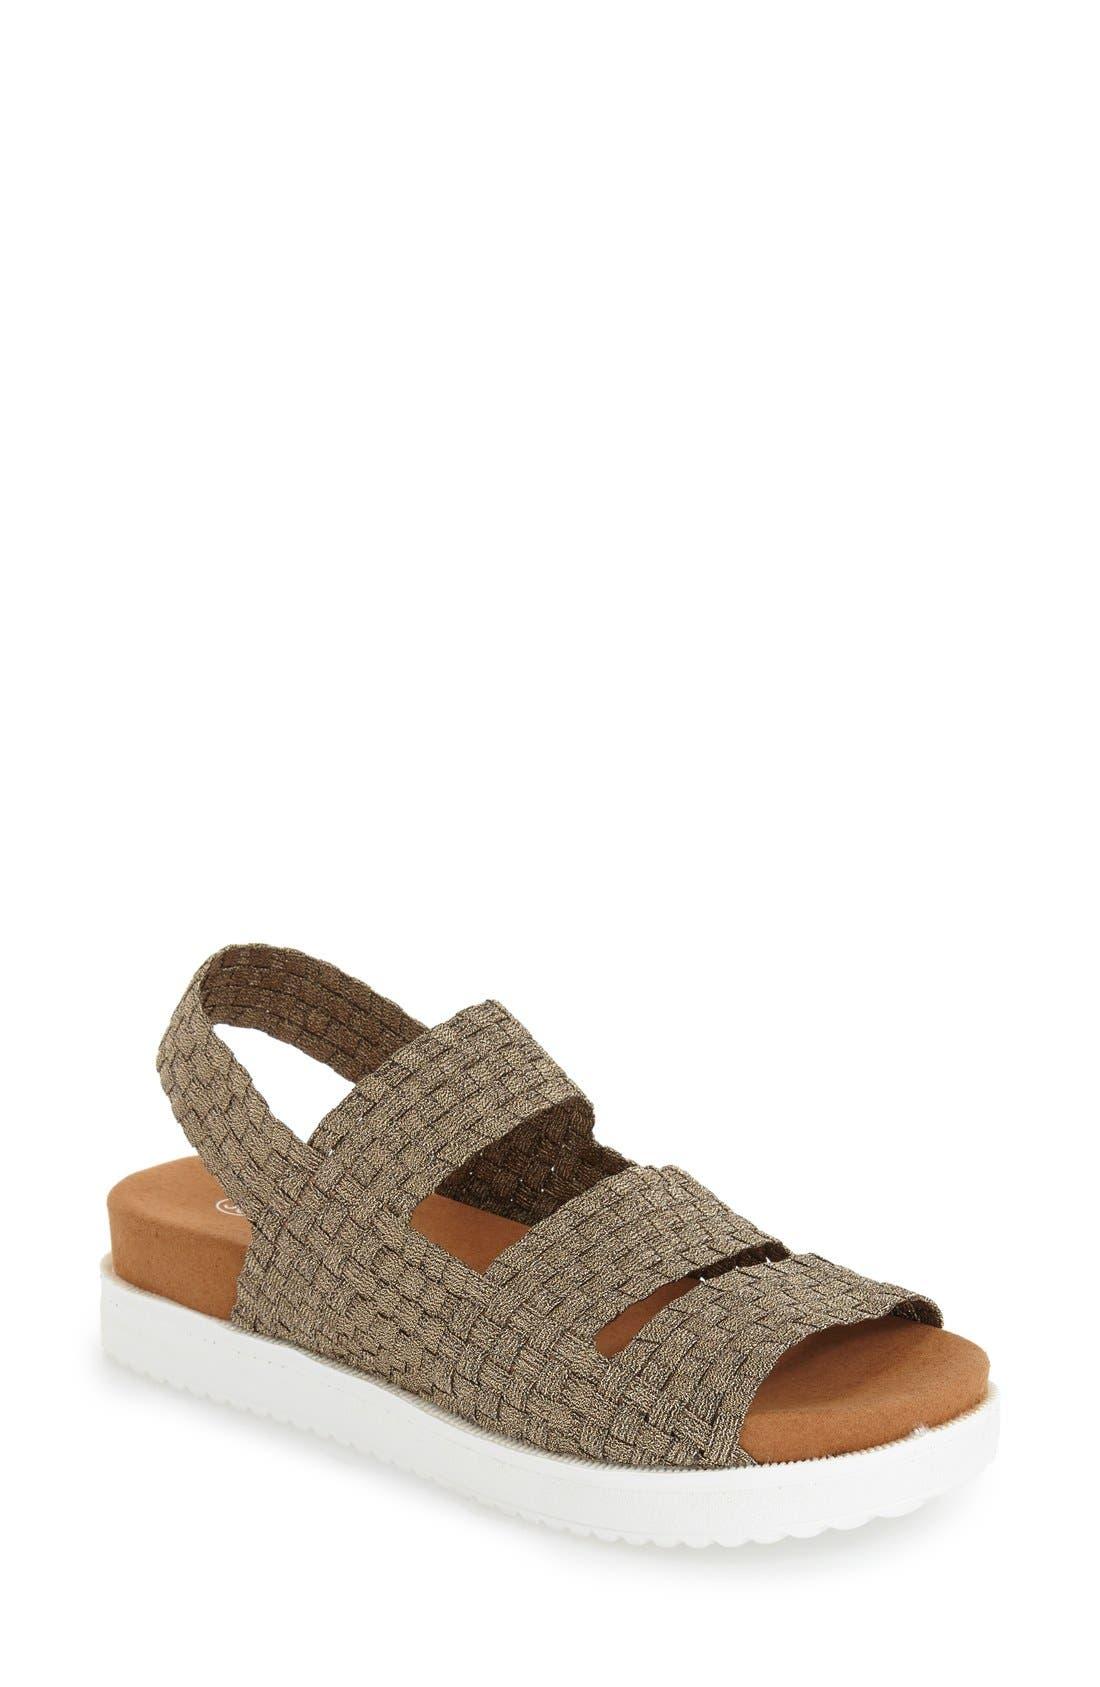 'Crisp' Woven Platform Sandal